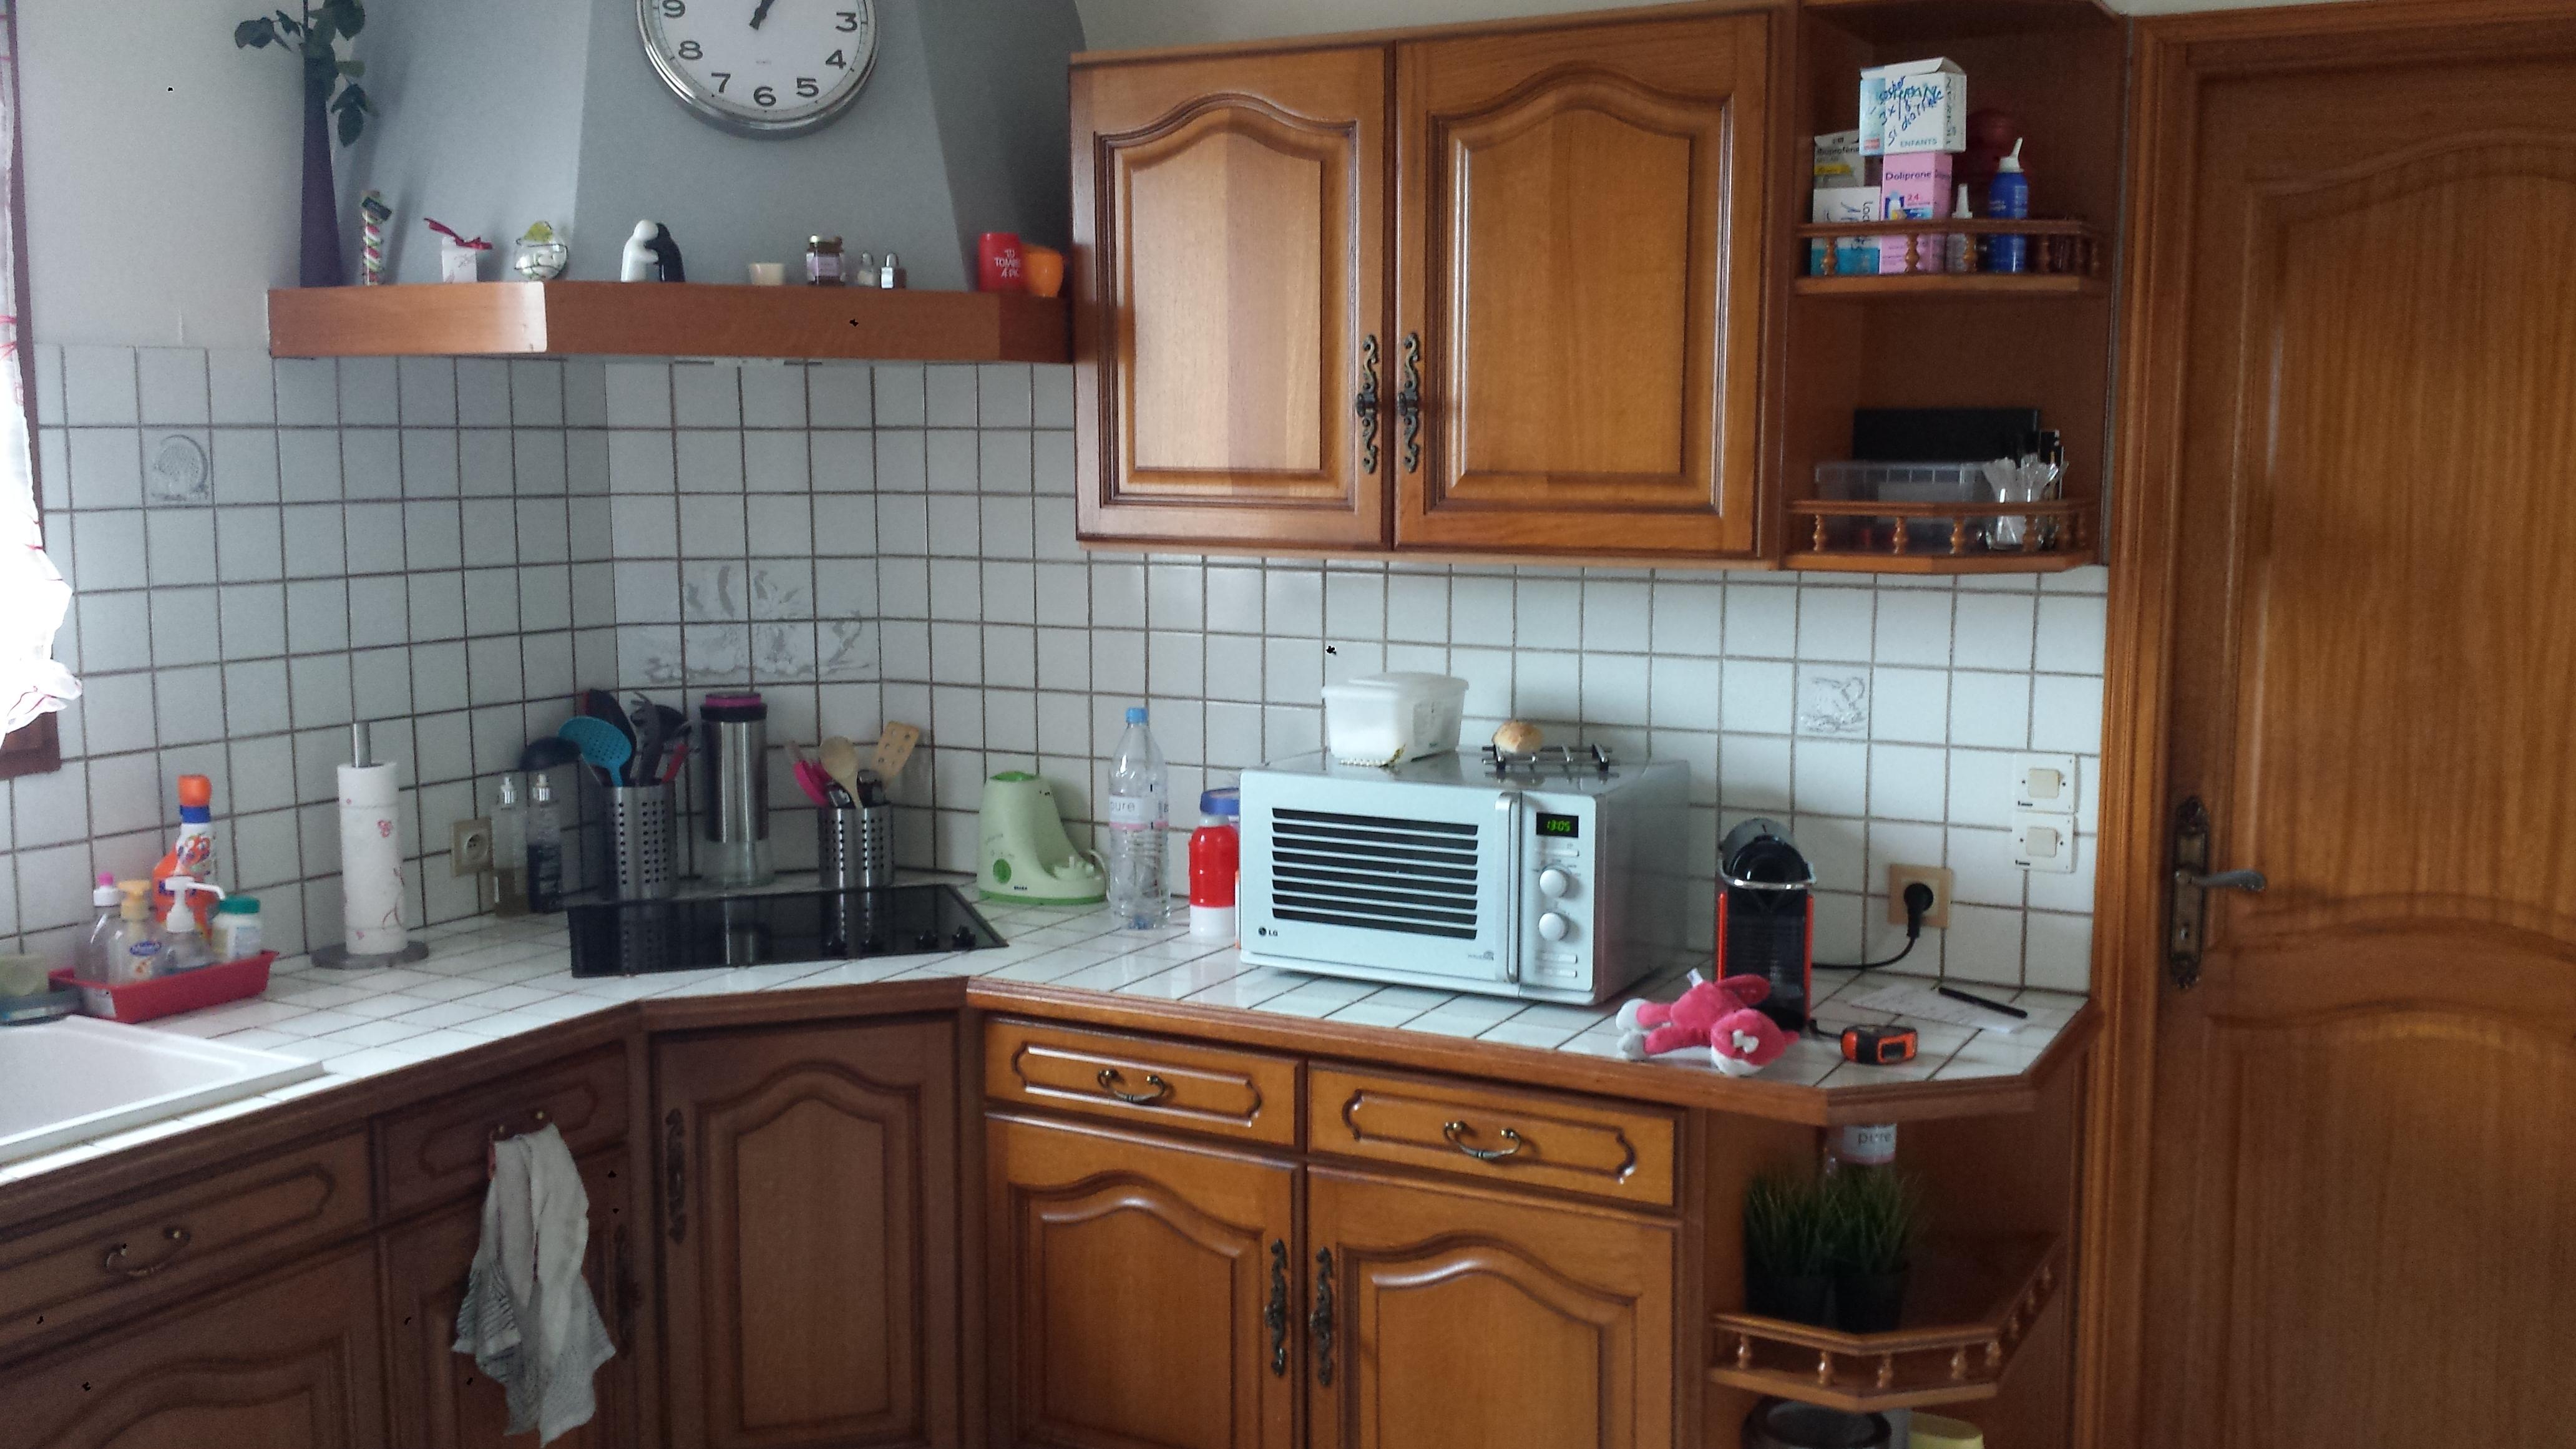 Ancien Meuble Cuisine Ikea forums leroy merlin - communauté leroy merlin